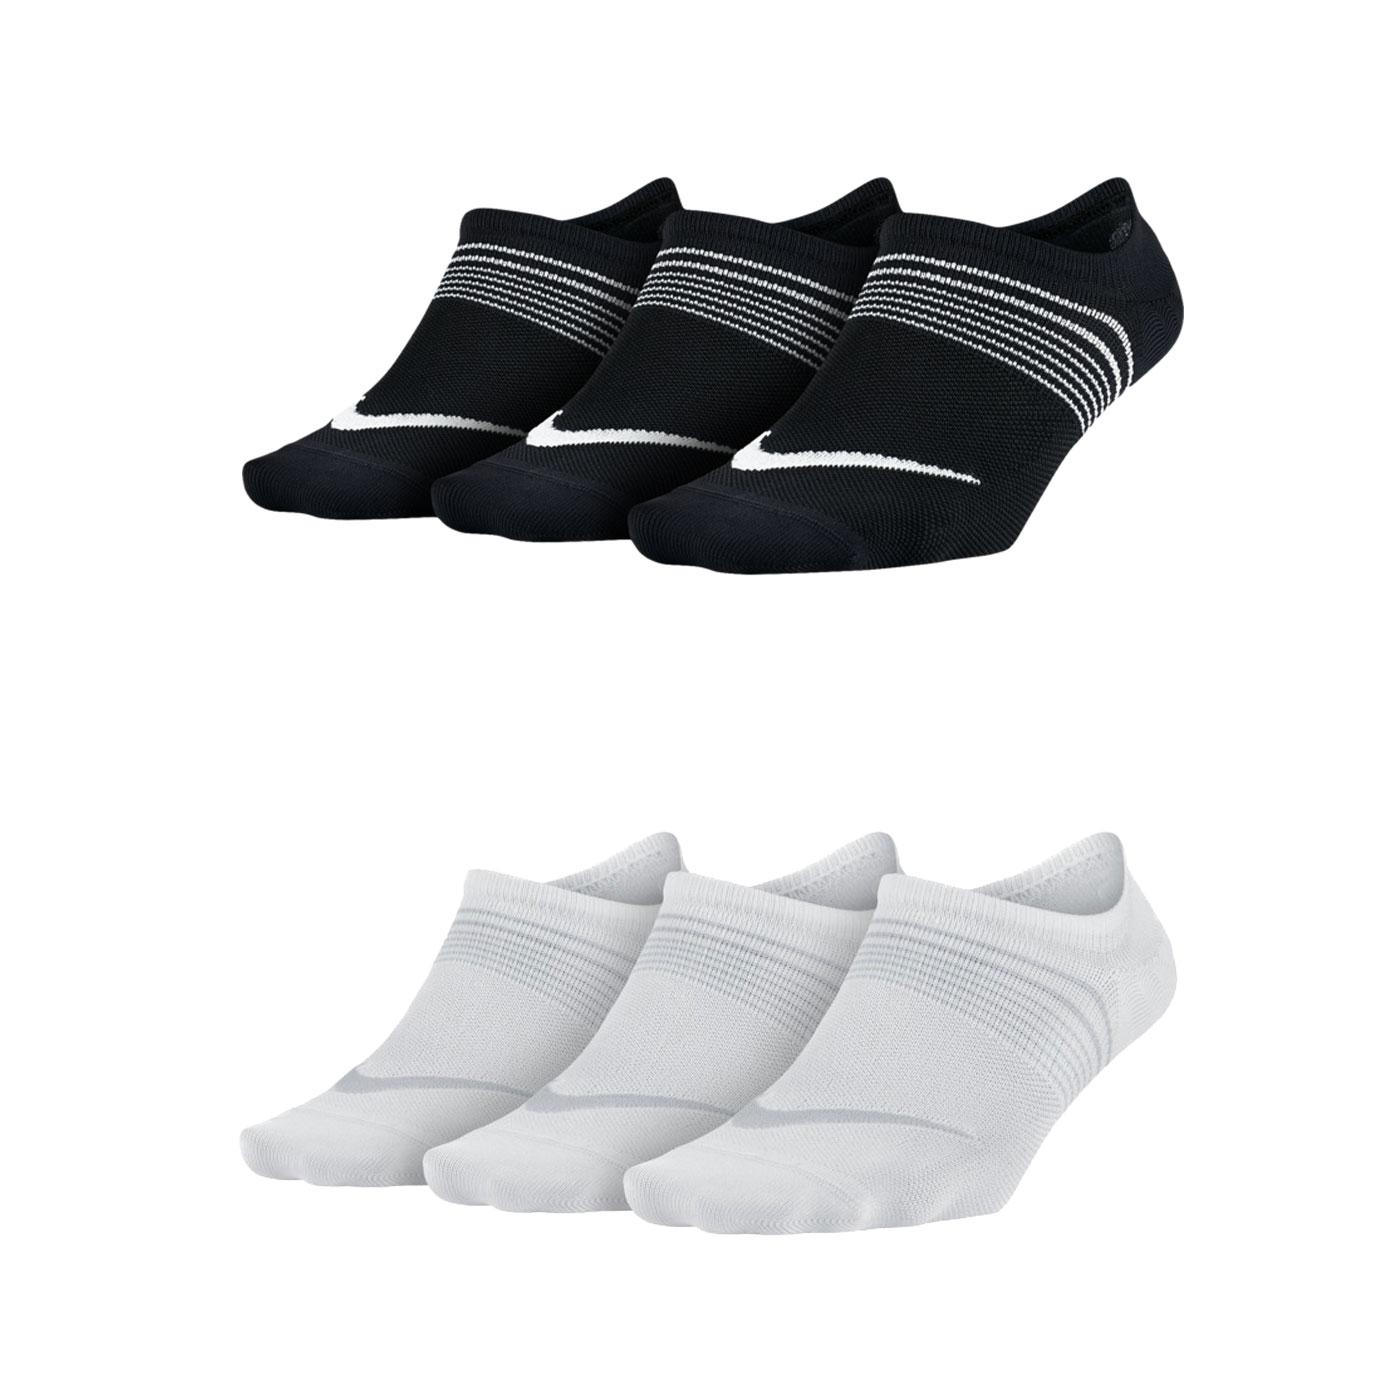 NIKE 三包女子輕質訓練襪 SX5277-100